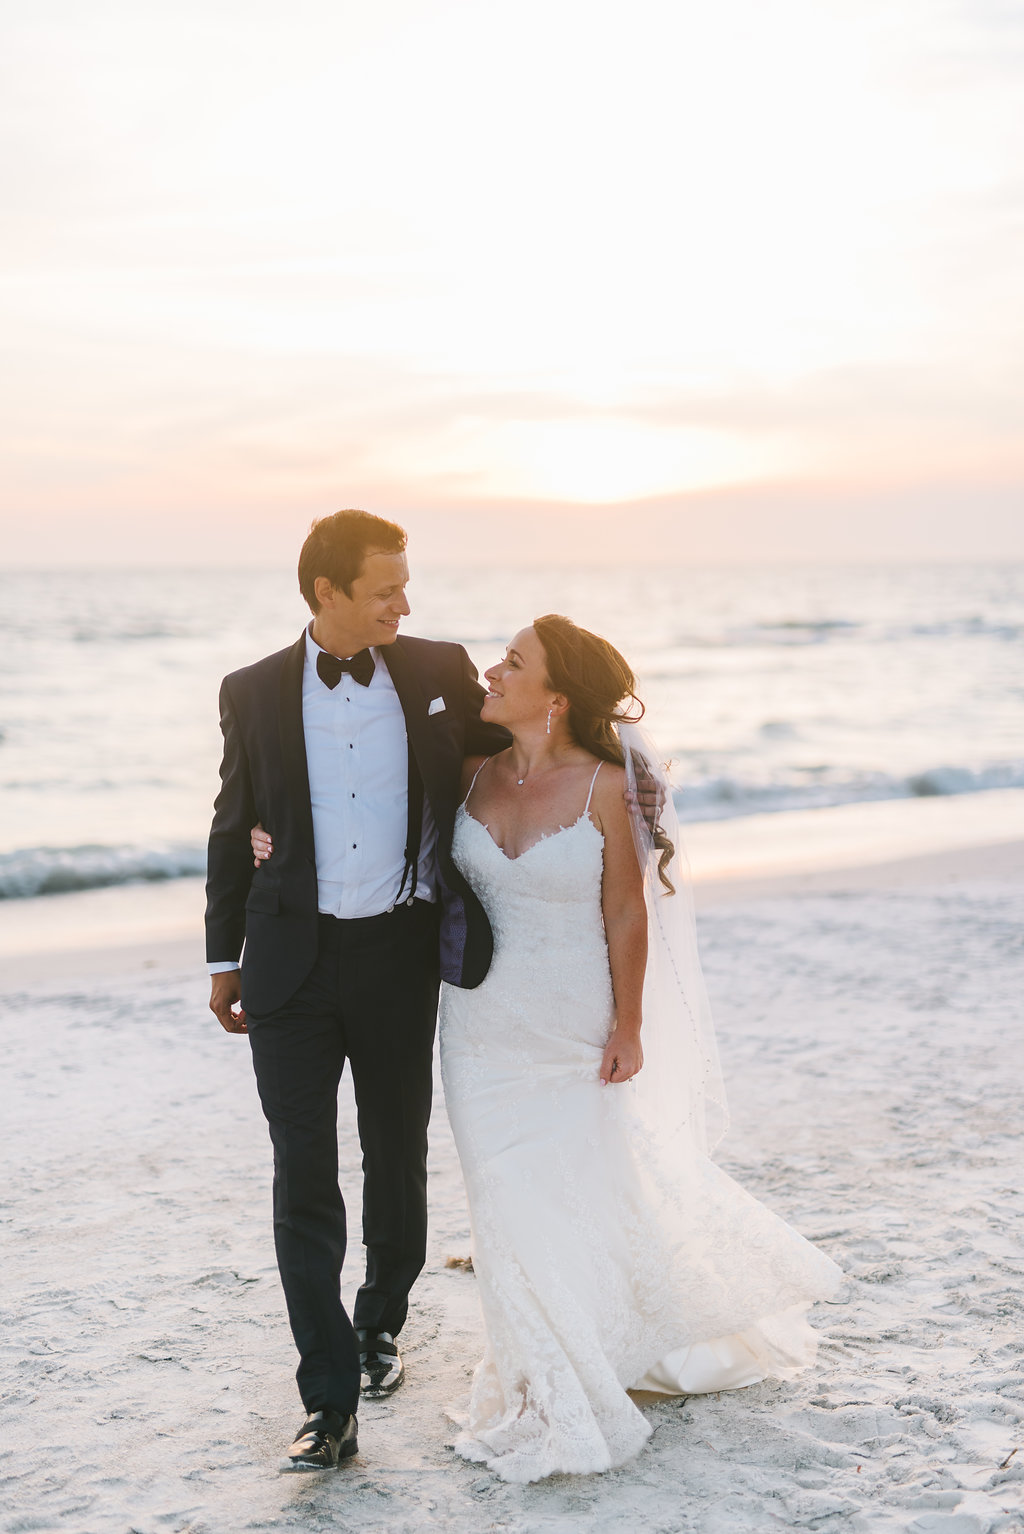 33323dde9c Florida Outdoor Beach Sunset Bride and Groom Wedding Portrait | Tampa Bay  Photographer Kera Photography | St. Pete Beach Wedding Venue Tradewinds  Island ...